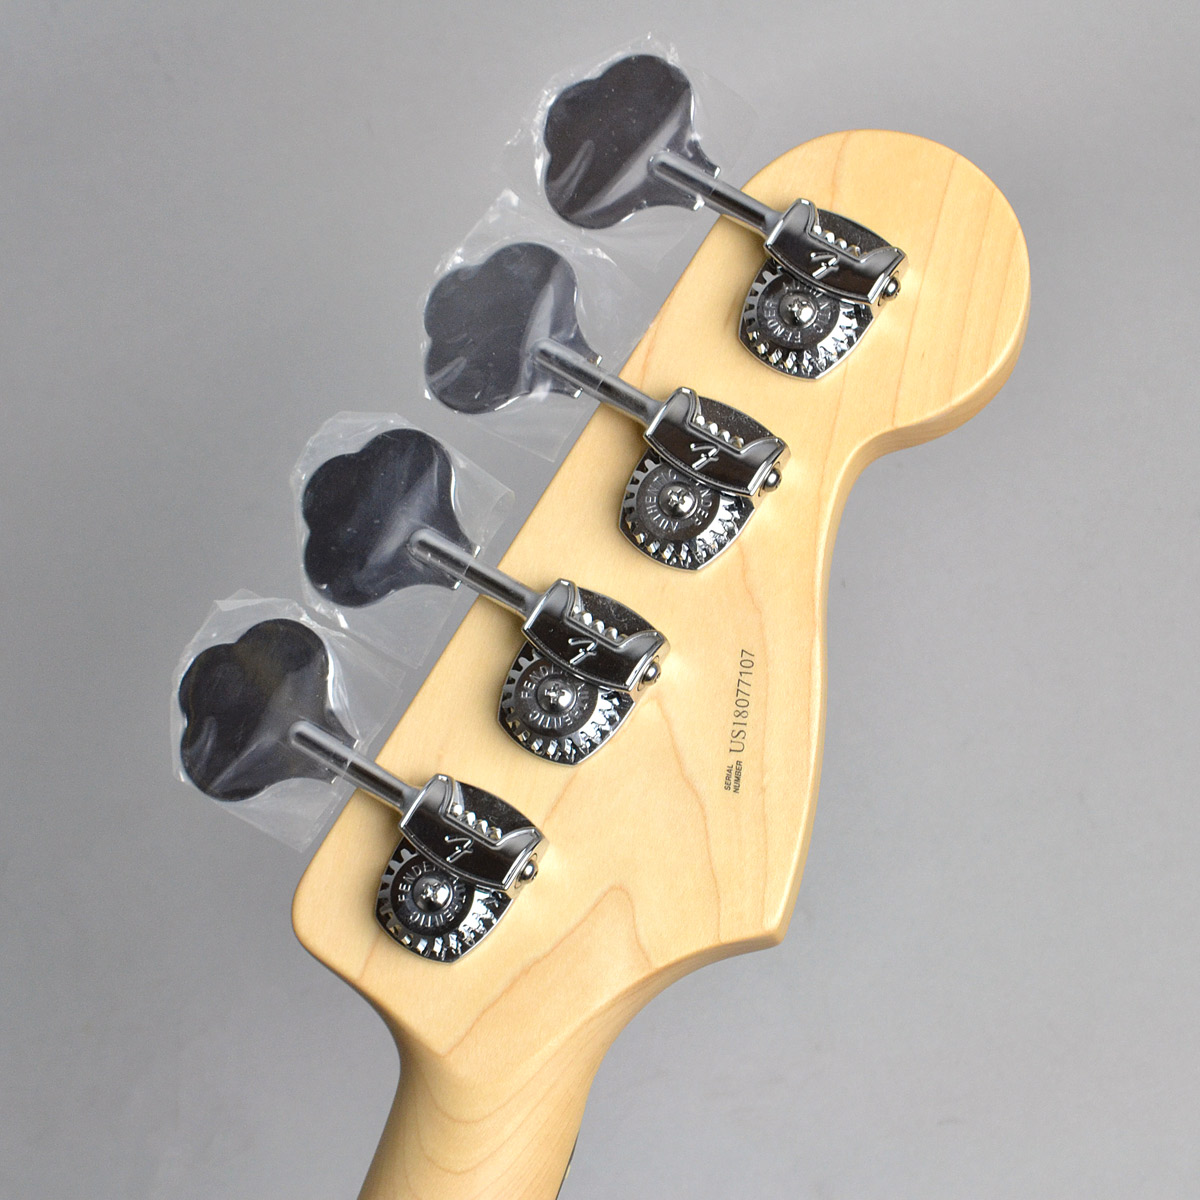 American Professional Jazz Bass Left-Handのヘッド裏-アップ画像